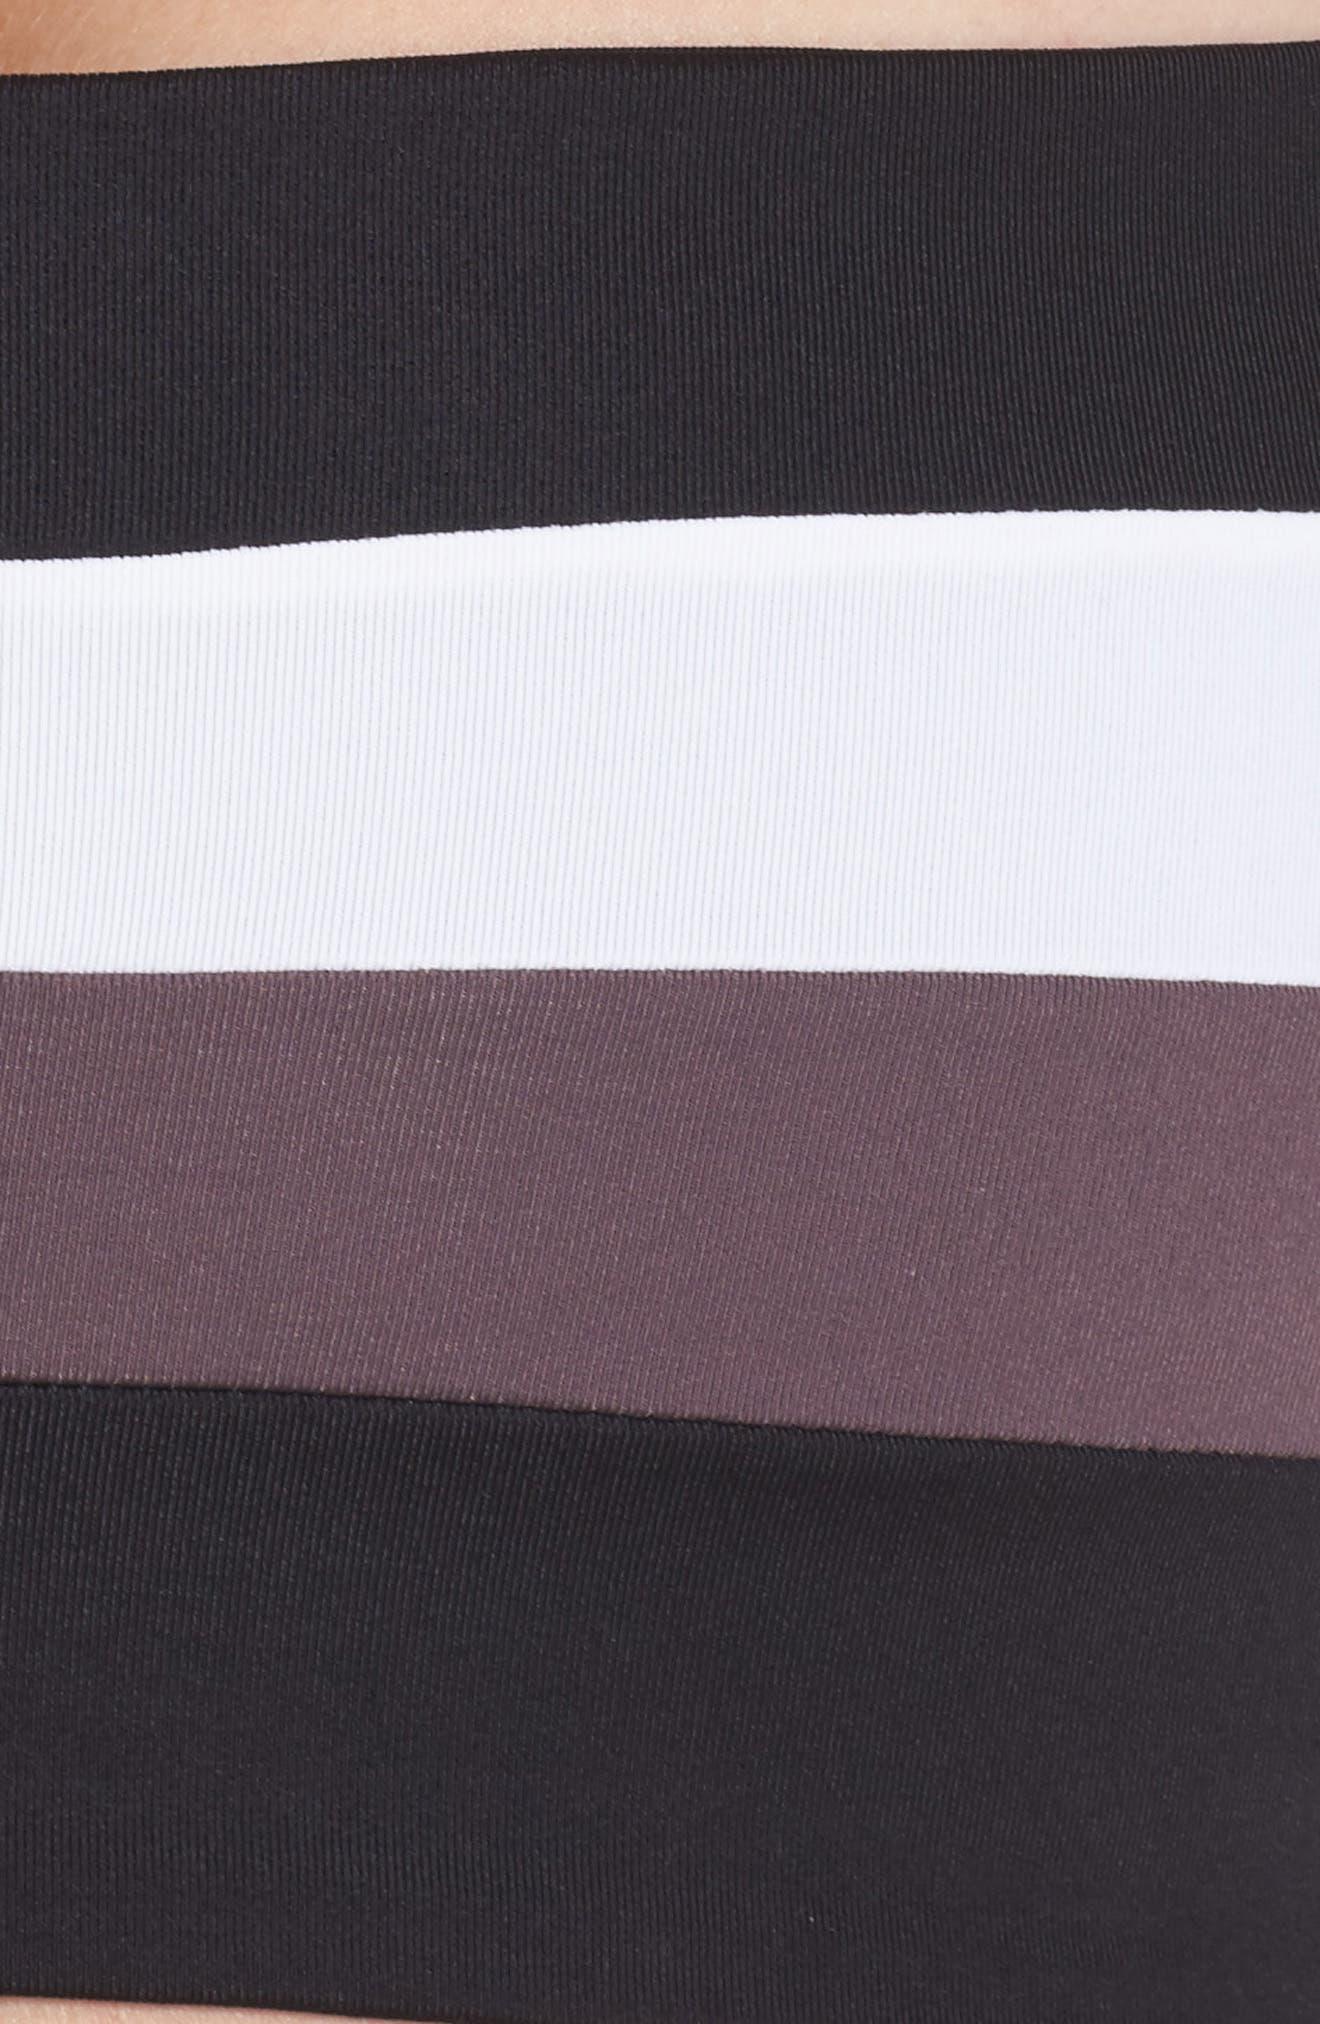 Rebel Bikini Top,                             Alternate thumbnail 5, color,                             001